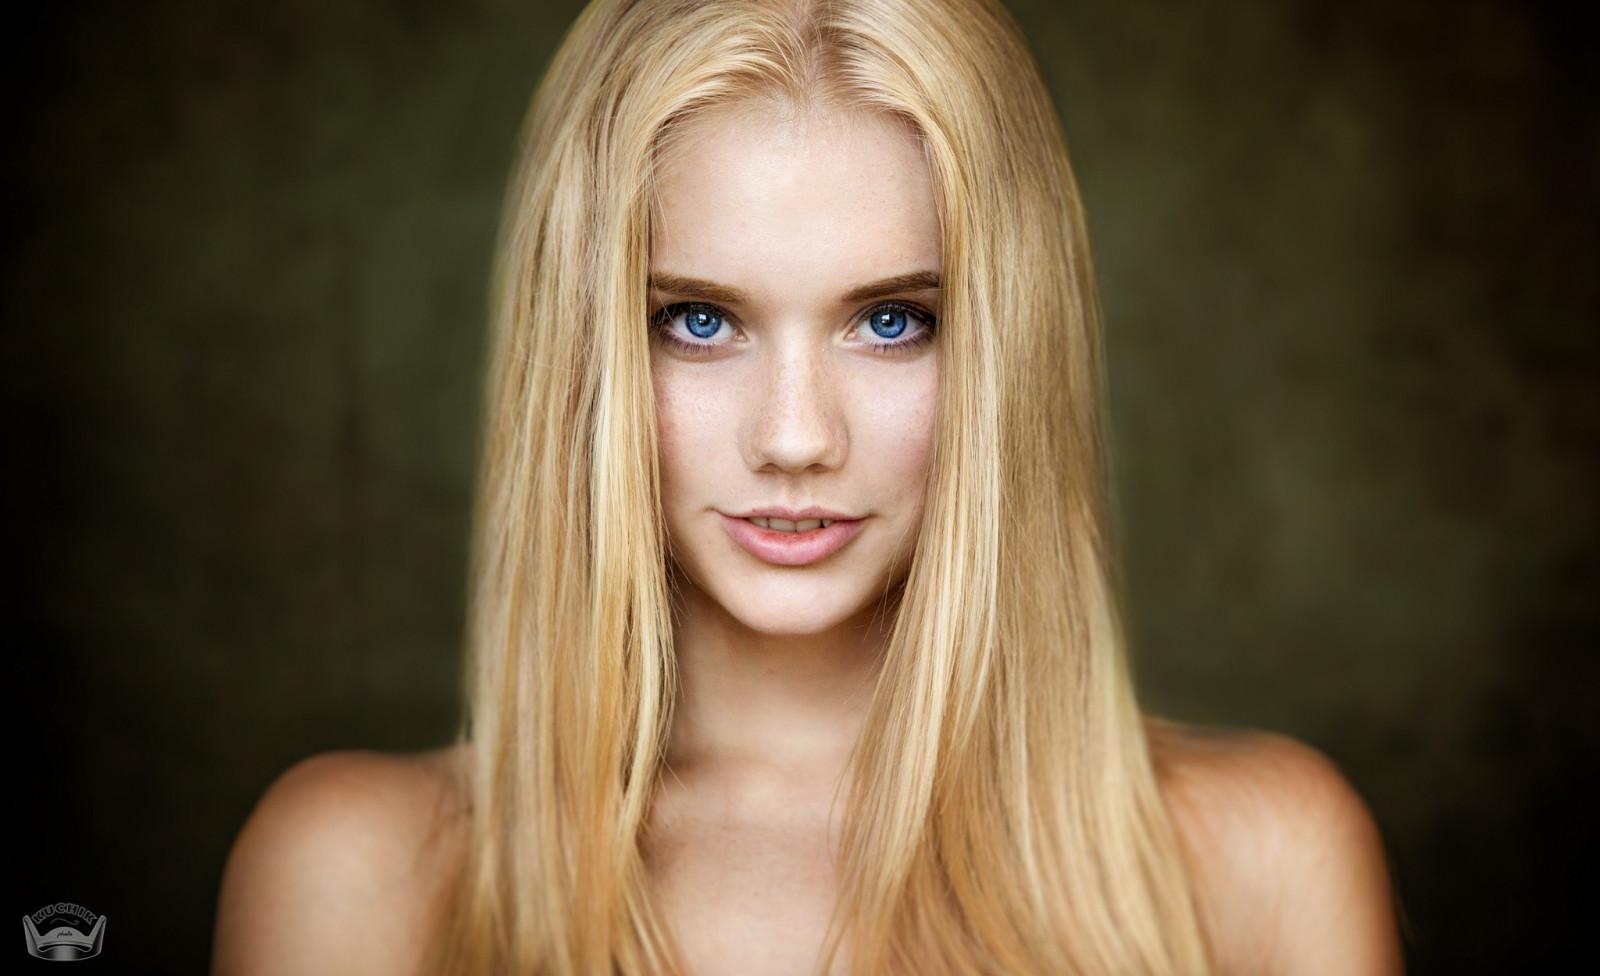 Wallpaper Face Model Blonde Long Hair Blue Eyes: Wallpaper : Face, Women, Blonde, Depth Of Field, Simple